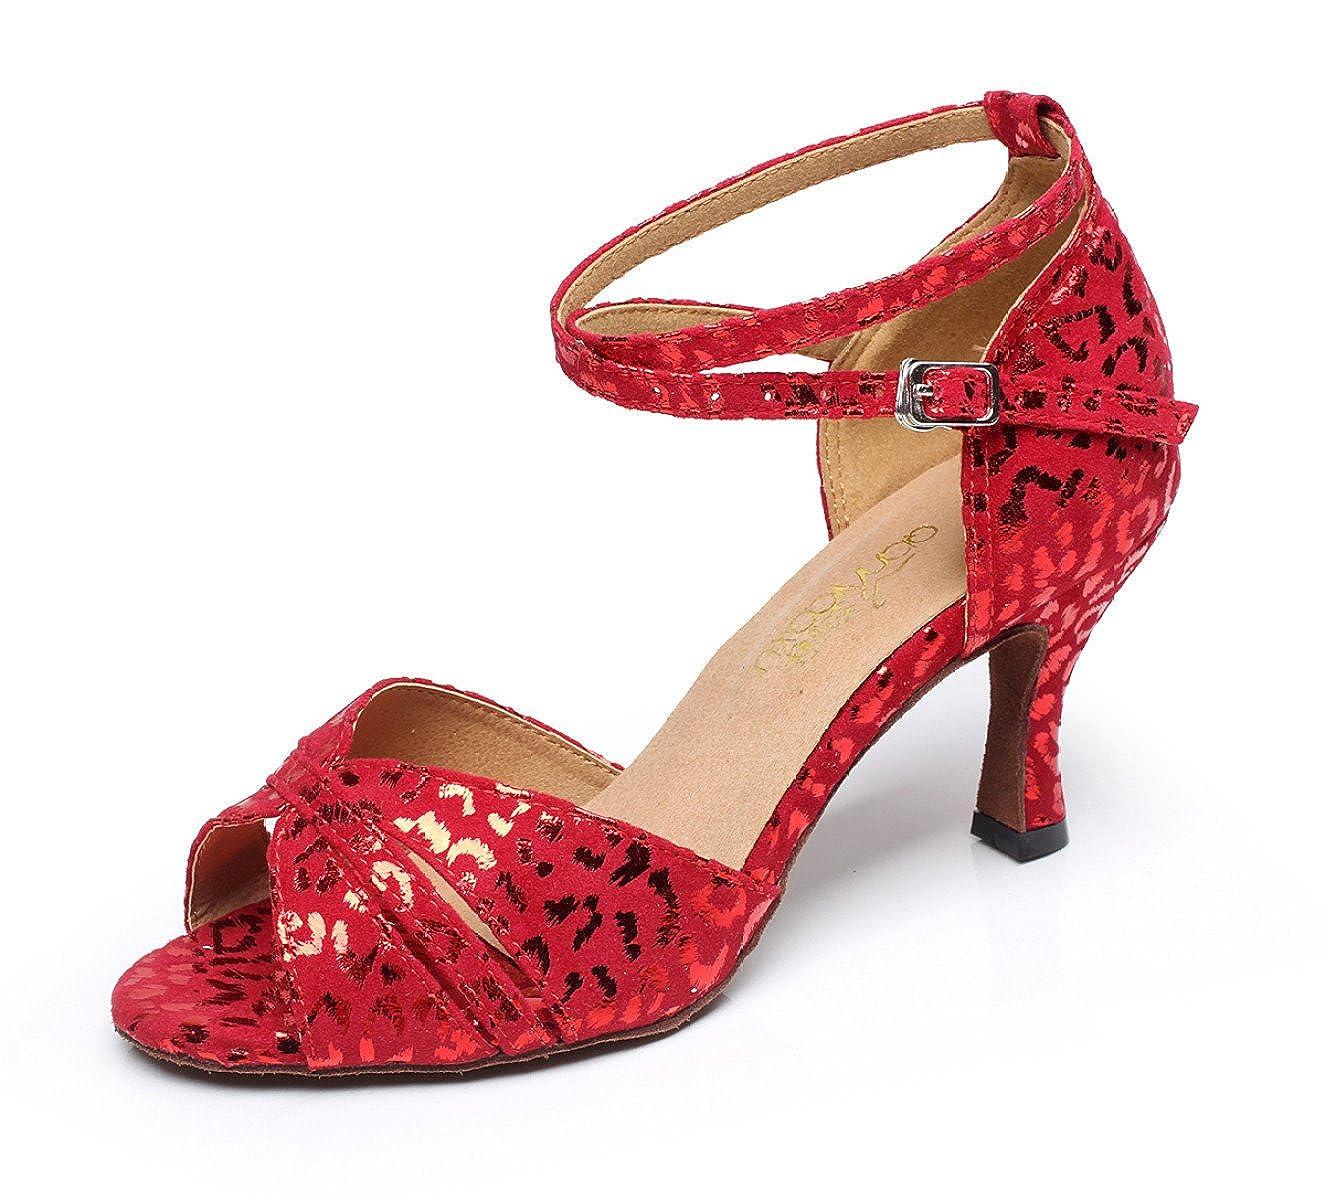 JSHOE Sexy Salsa Jazz Ballroom Dance Talons Chaussures Ballroom Chaussures Latin Tango Party Danse Chaussures Talons Hauts,Red-heeled7.5cm-UK4/EU35/Our36 - 5263a29 - boatplans.space